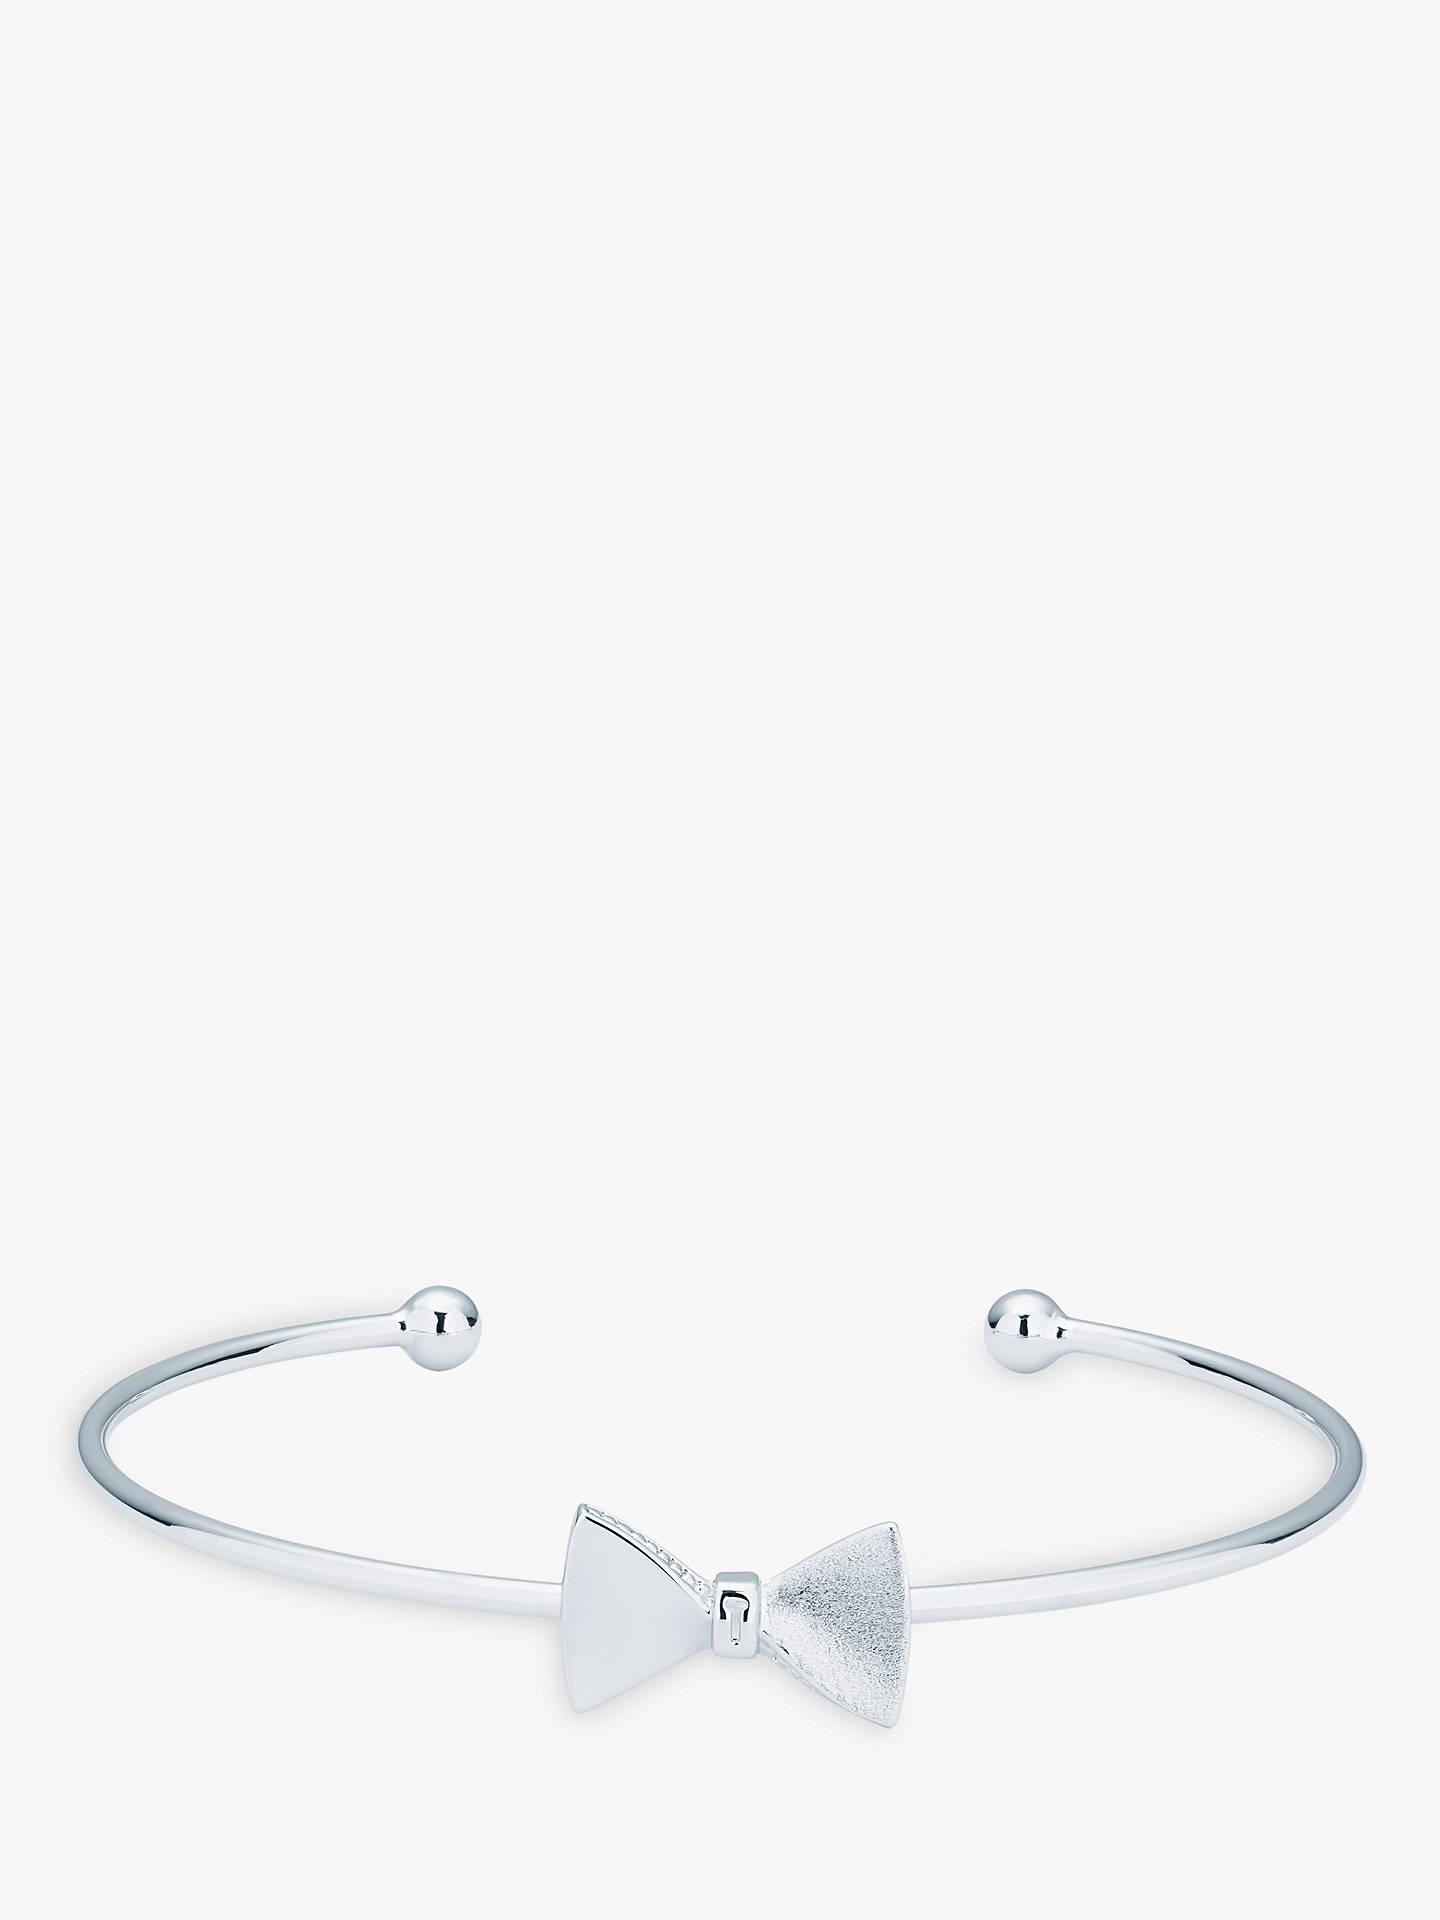 247f5c52c3a0 Ted Baker Tarsha Swarovski Crystal Bow Cuff at John Lewis   Partners